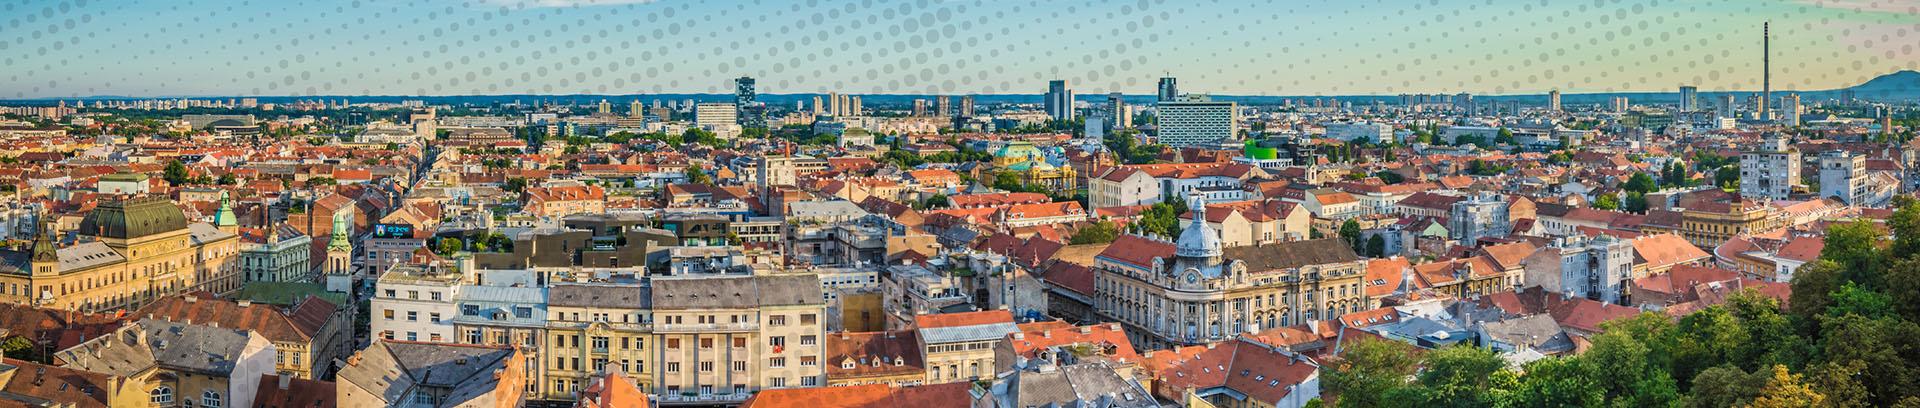 ga-conference-2020-zagreb background